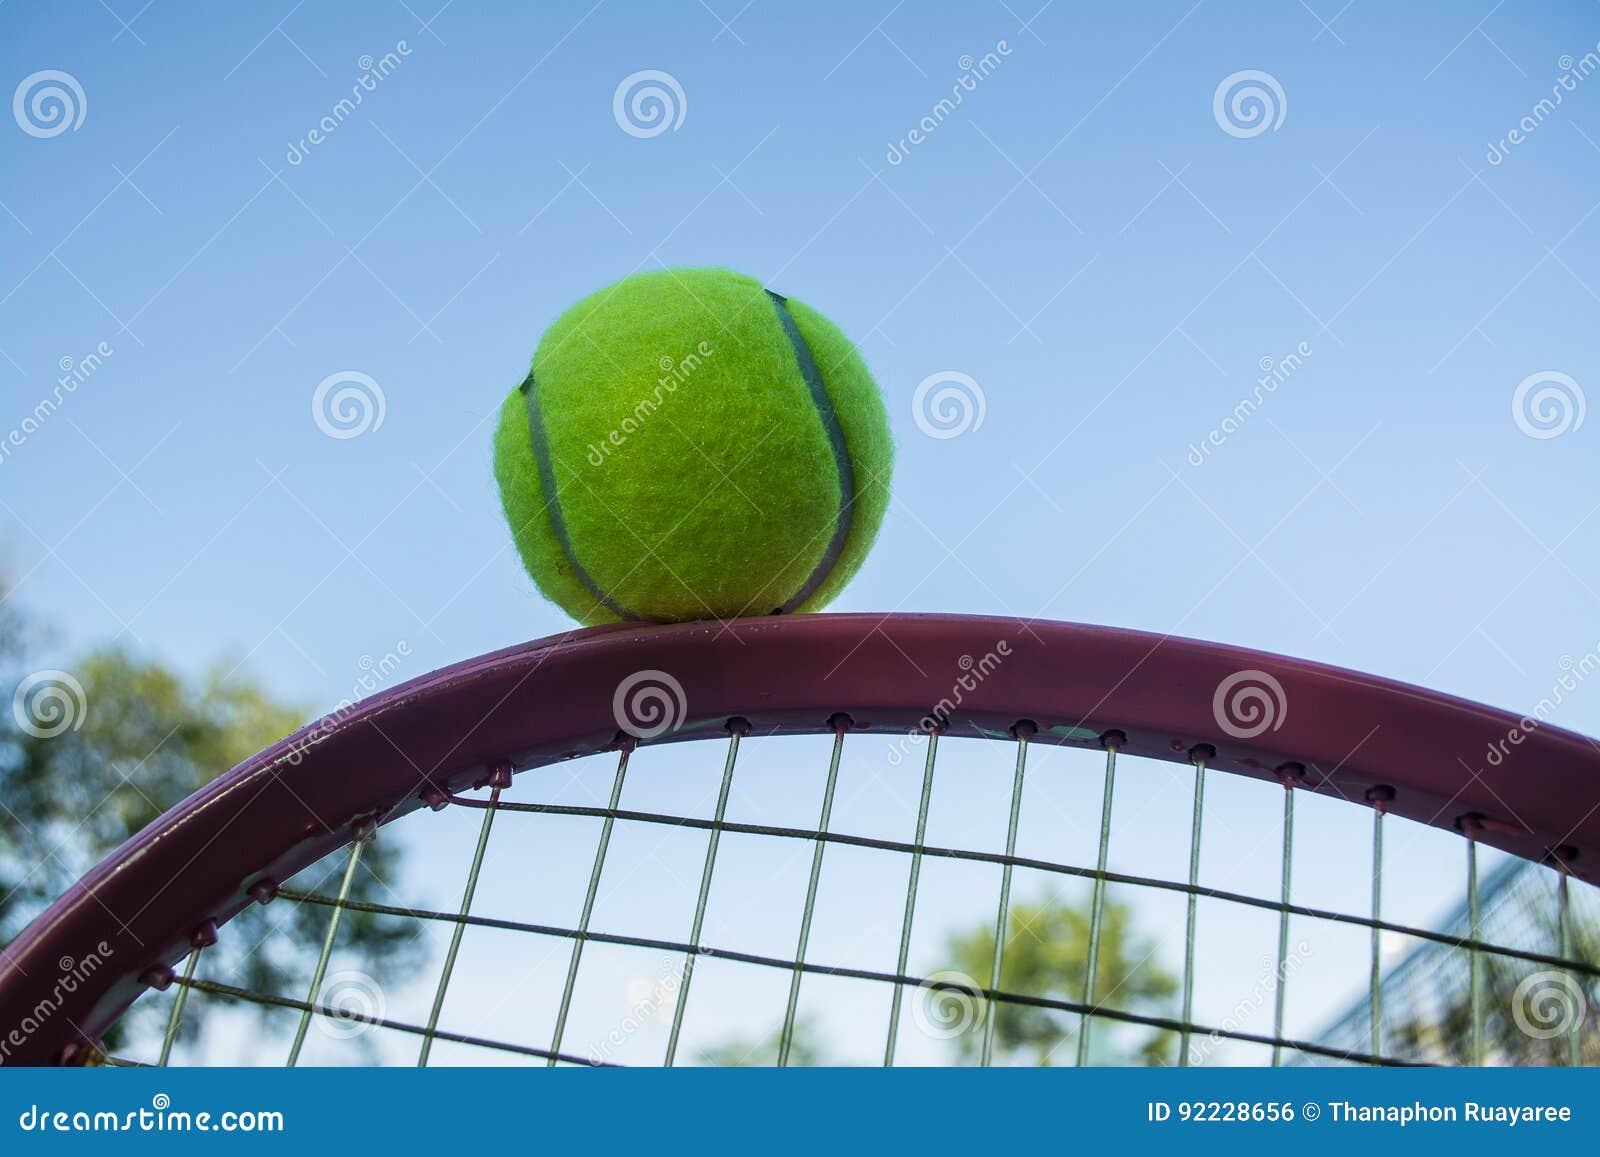 Sport de tennis